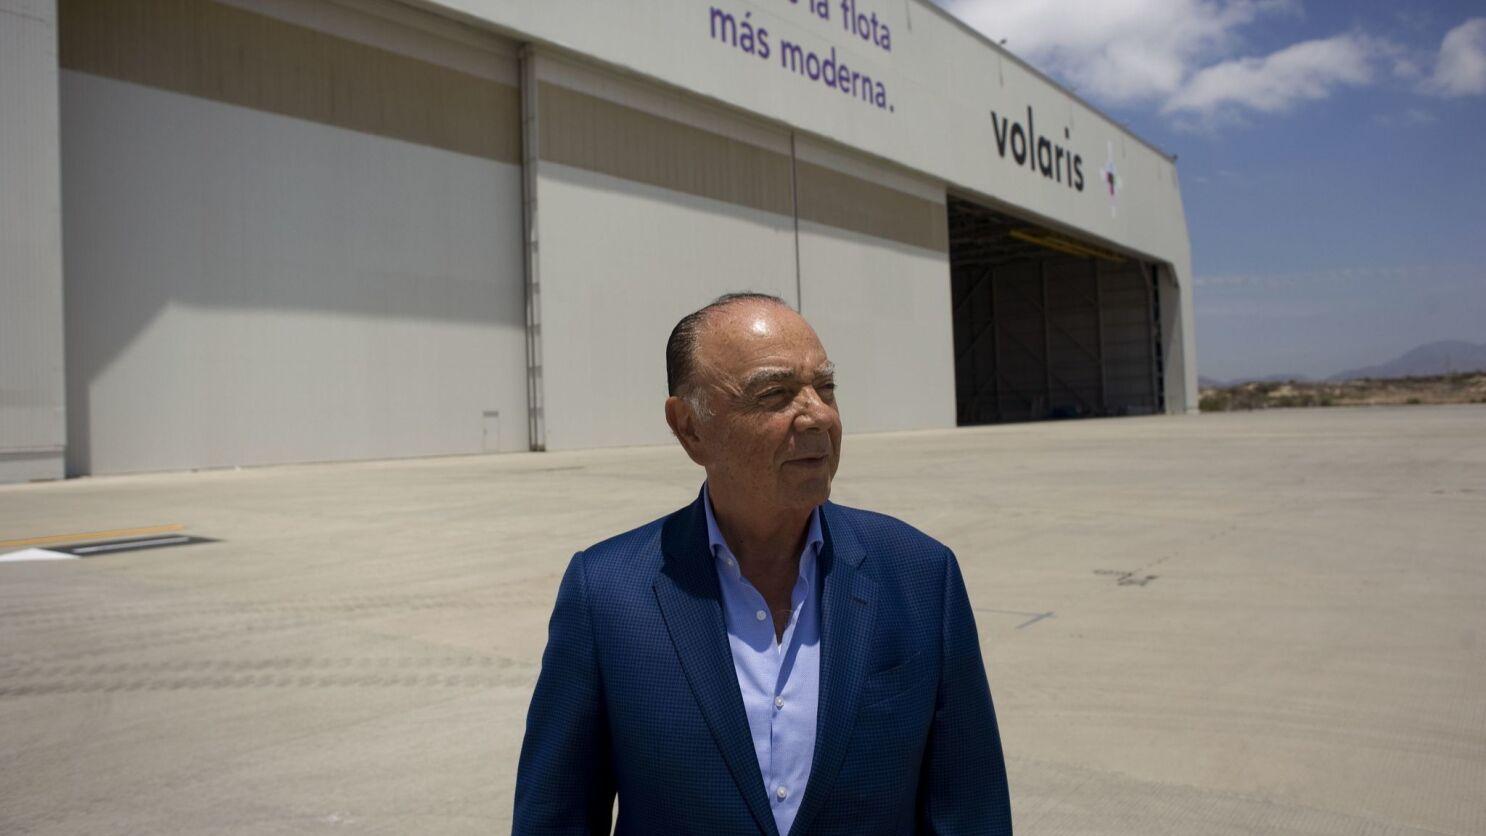 Former mayor launches bid to turn Tijuana into air cargo hub